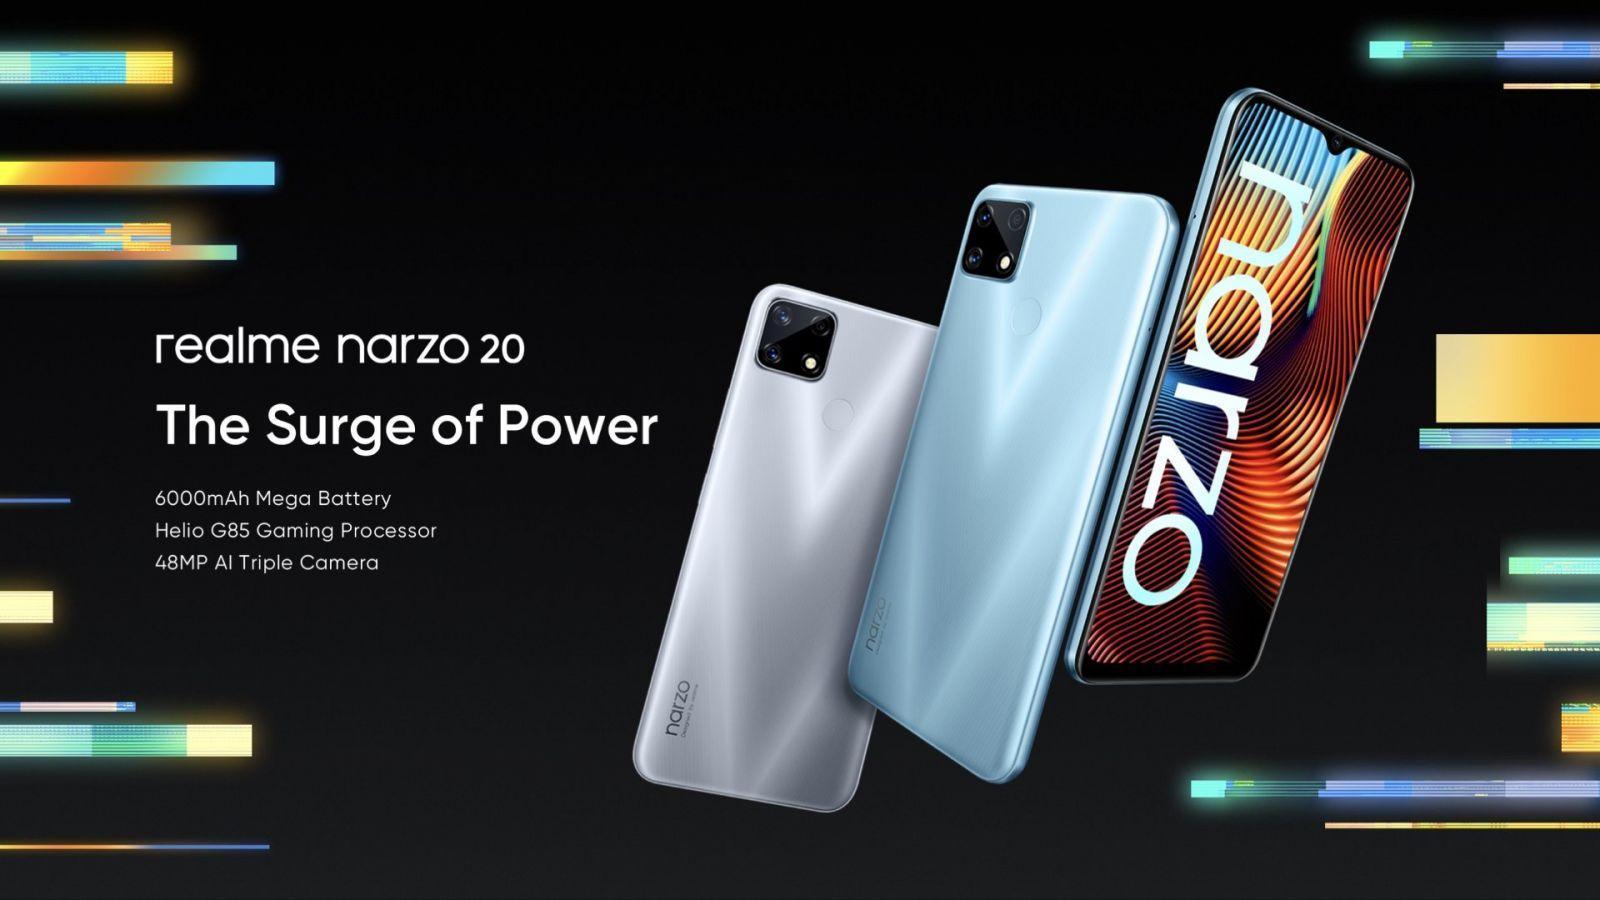 Realme представила линейку смартфонов Realme Narzo 20 (realme narzo 20 poster)